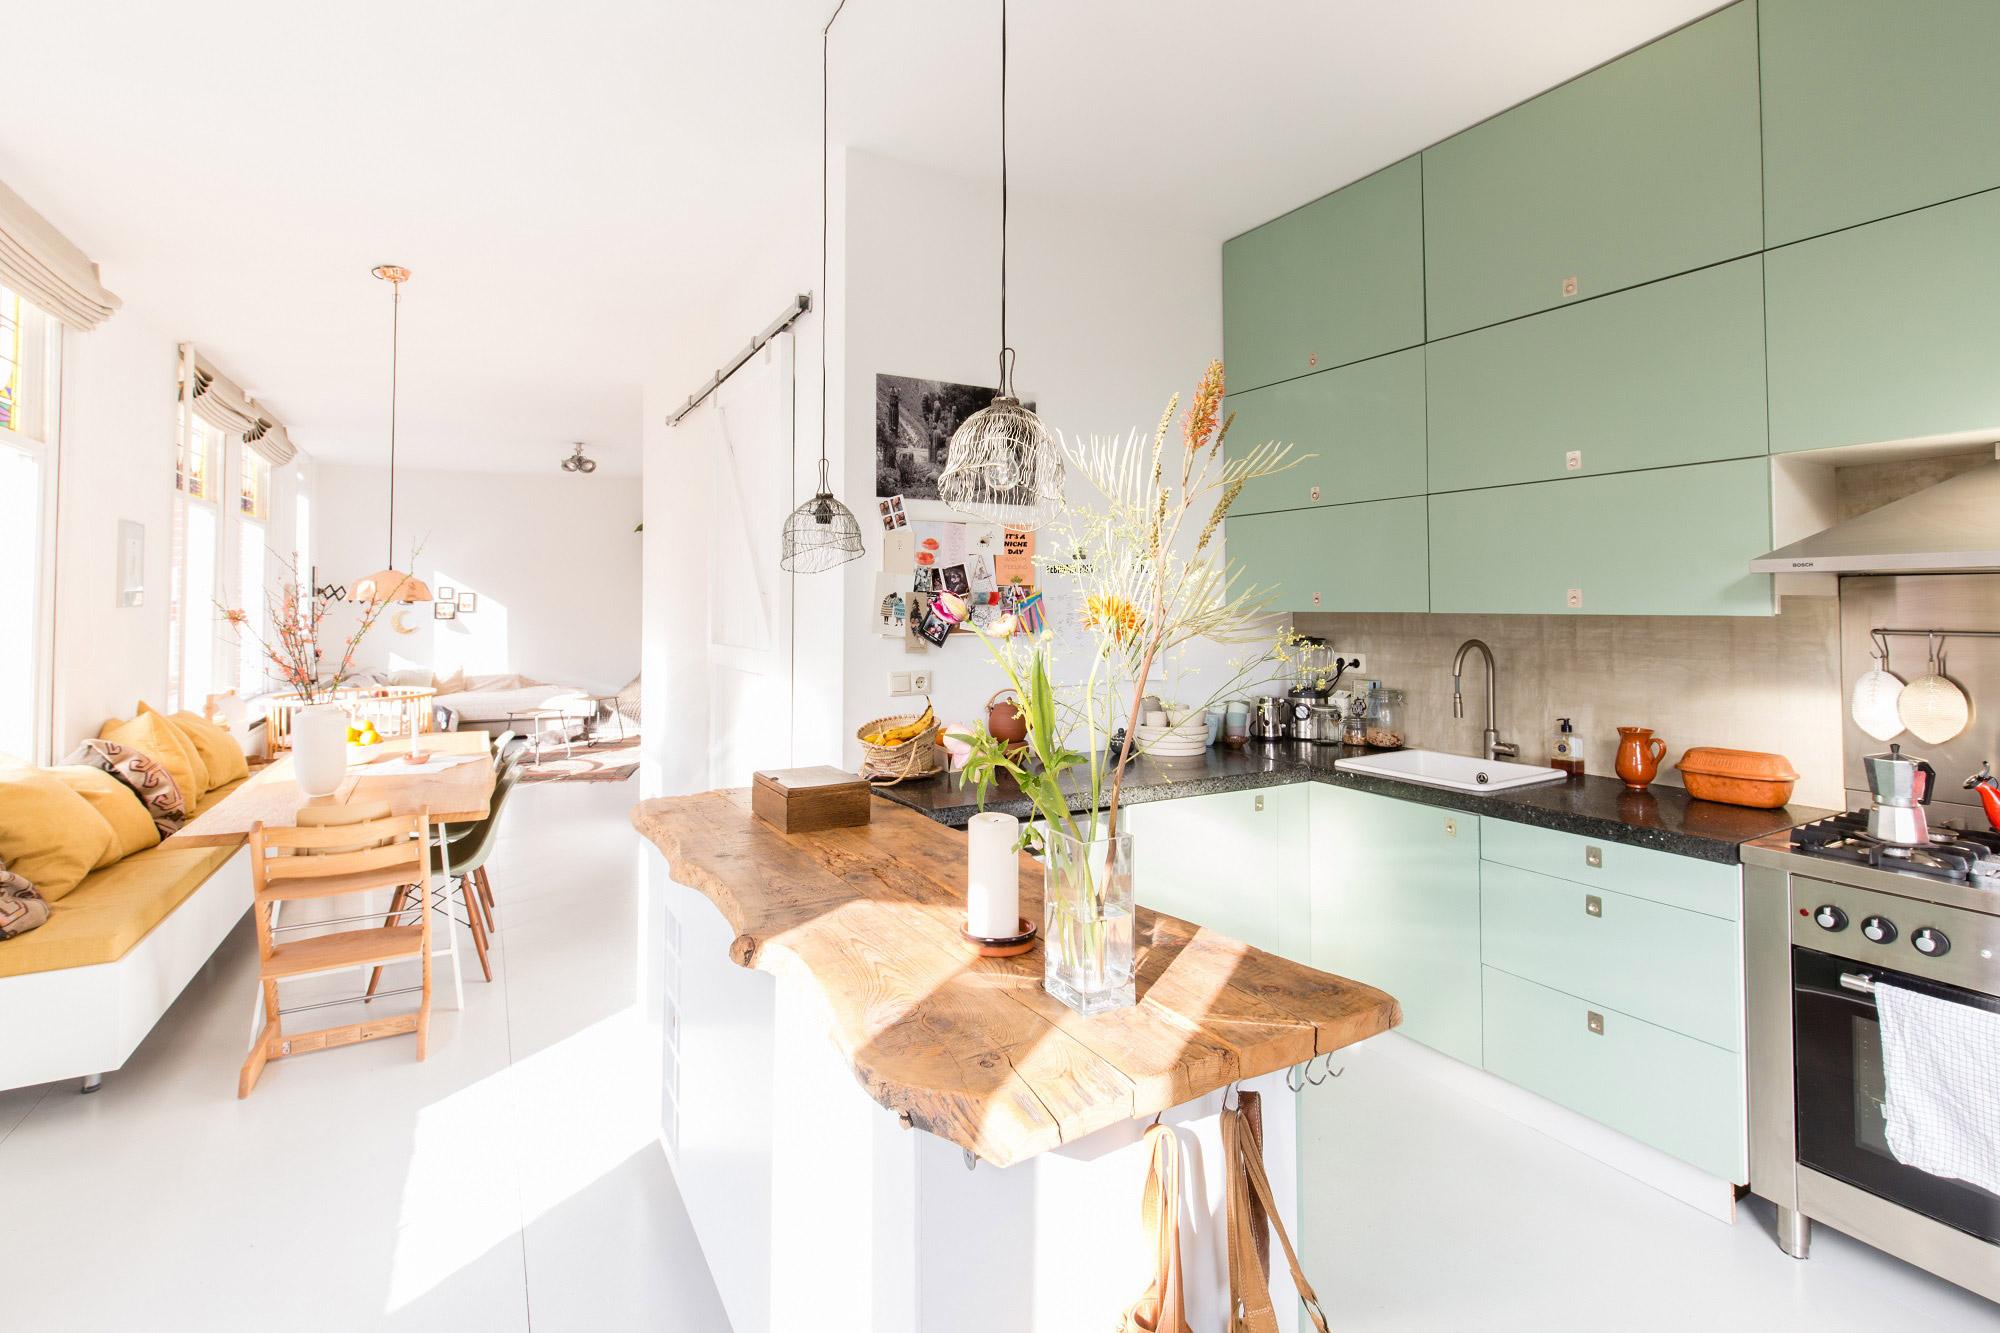 Casa accogliene estate in citt westwing magazine - Casa accogliente ...